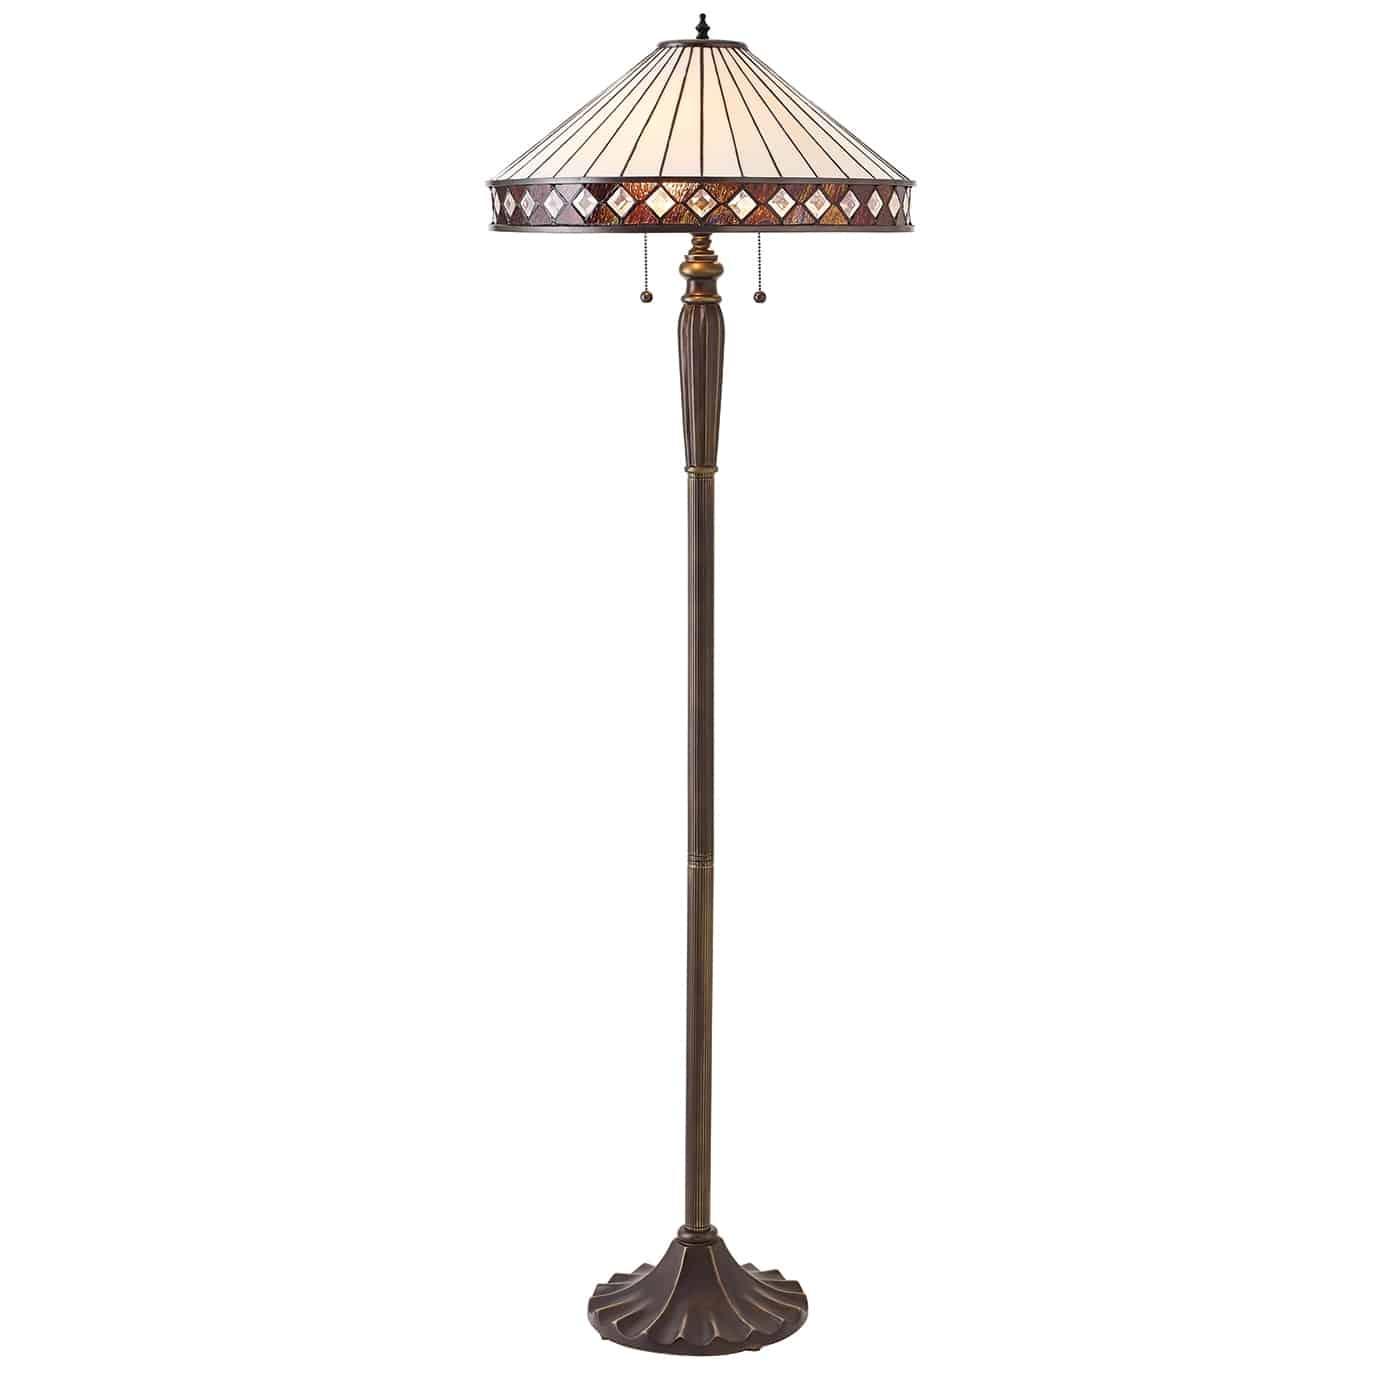 70936 Tiffany Floor Lamp